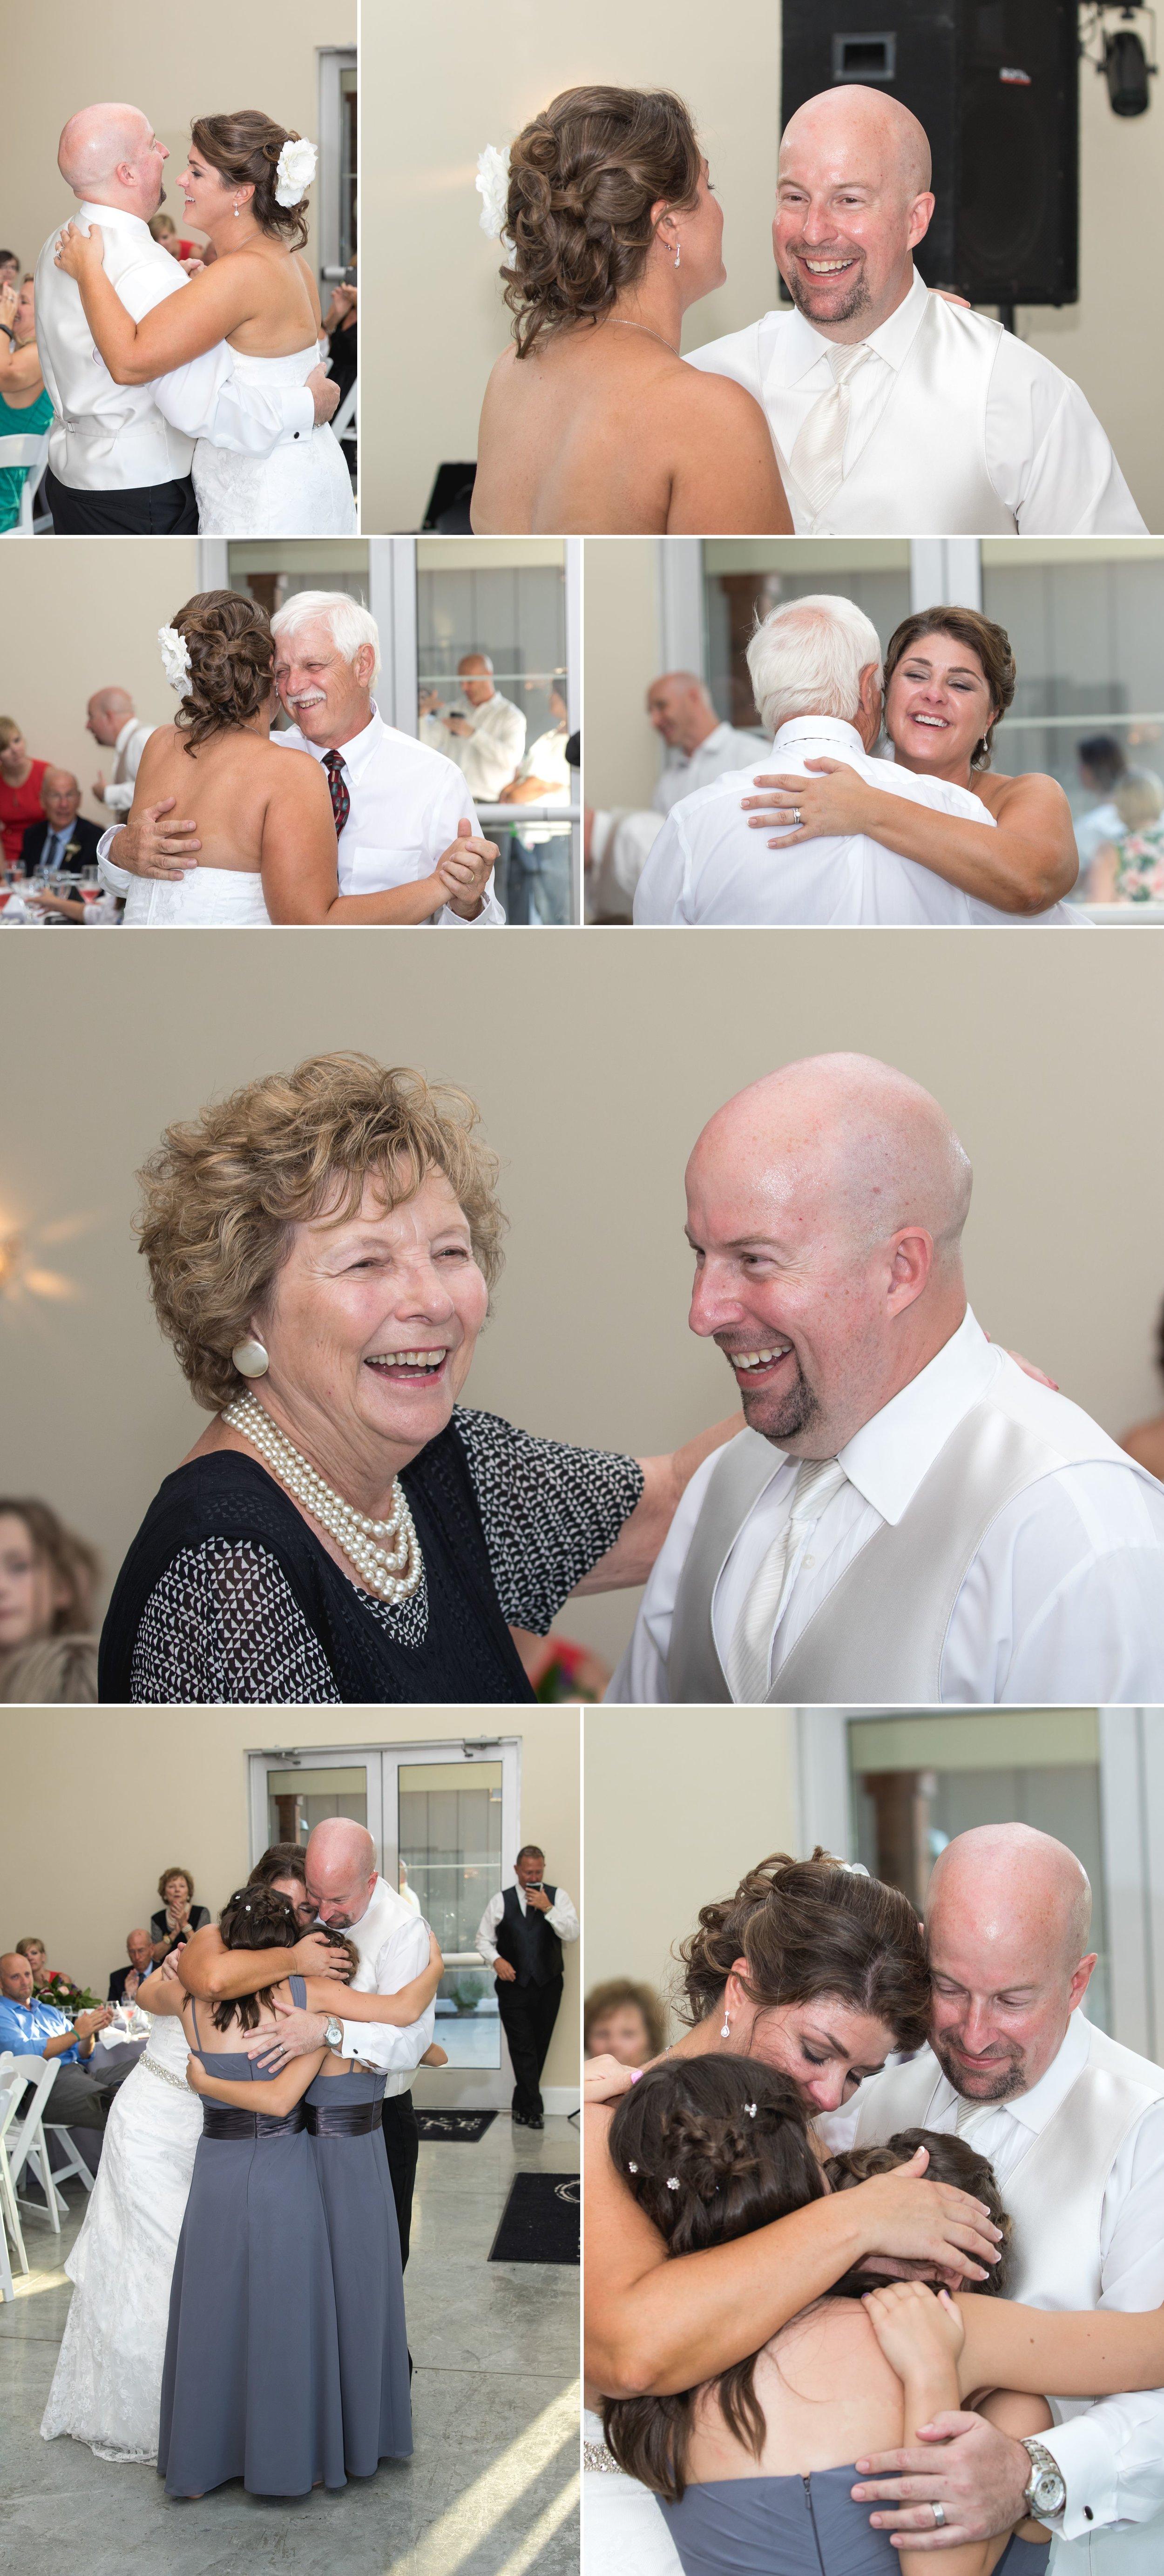 018-Buckeye-lake-winery-wedding-venue-columbus-ohio-wedding-muschlitz-photography-reception-03.JPG